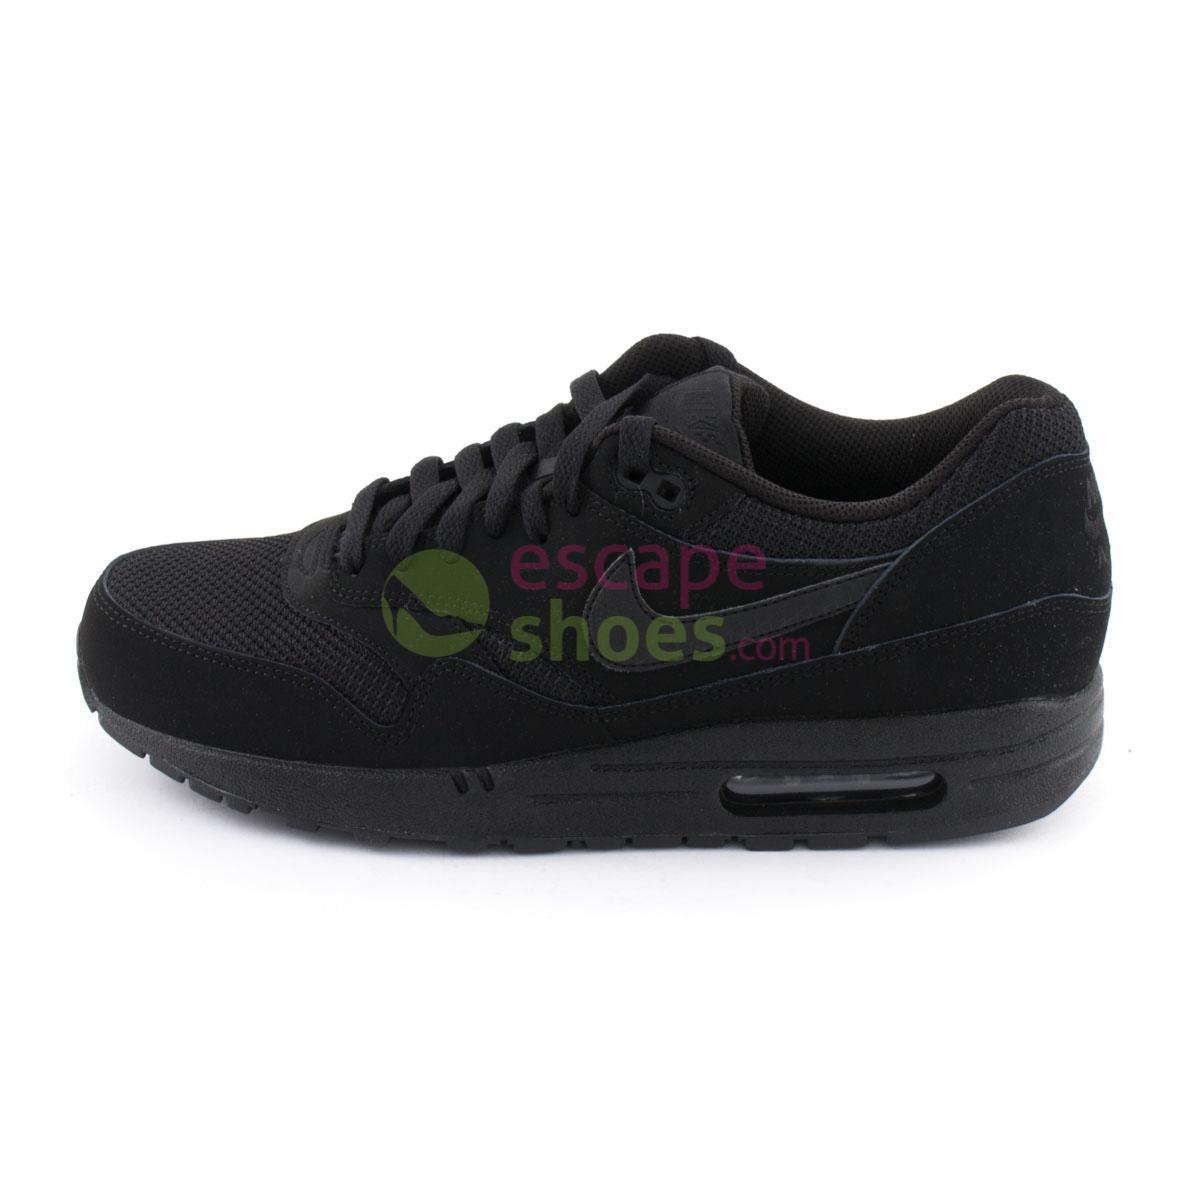 Sneakers NIKE Air Max 1 Essential Black 537383 025